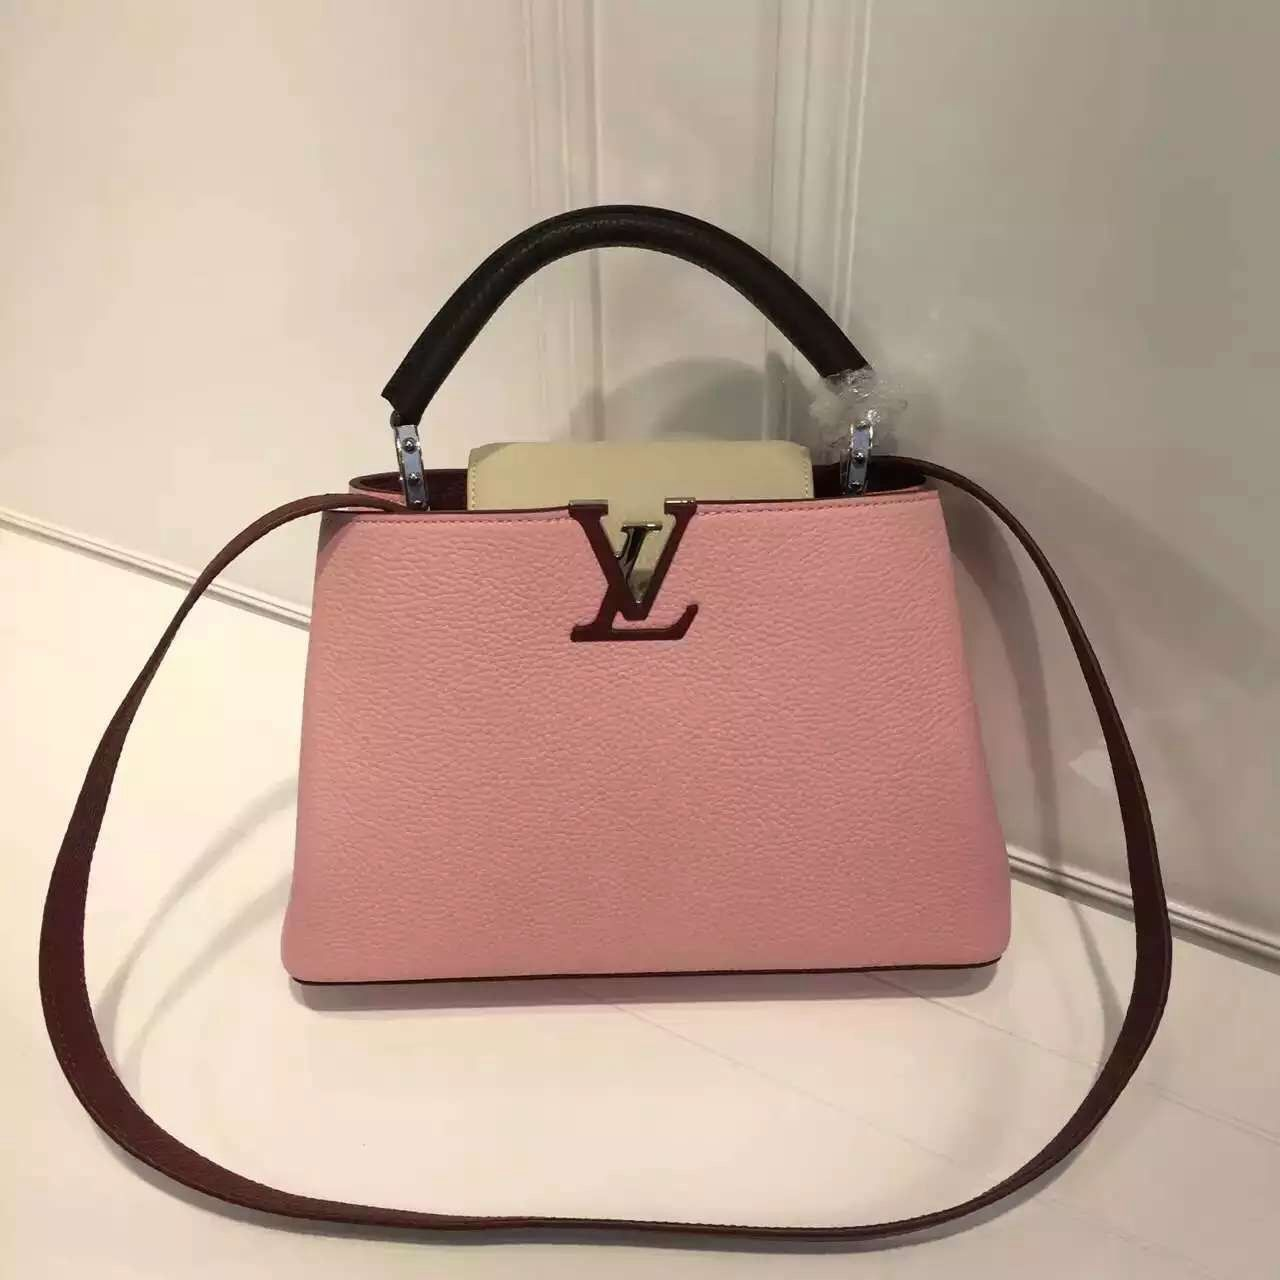 Louis Vuitton Grained Calfskin Multicolor Capucines BB Bag Capucines  Designer Bags For Less, Bag Sale f95a12abdb